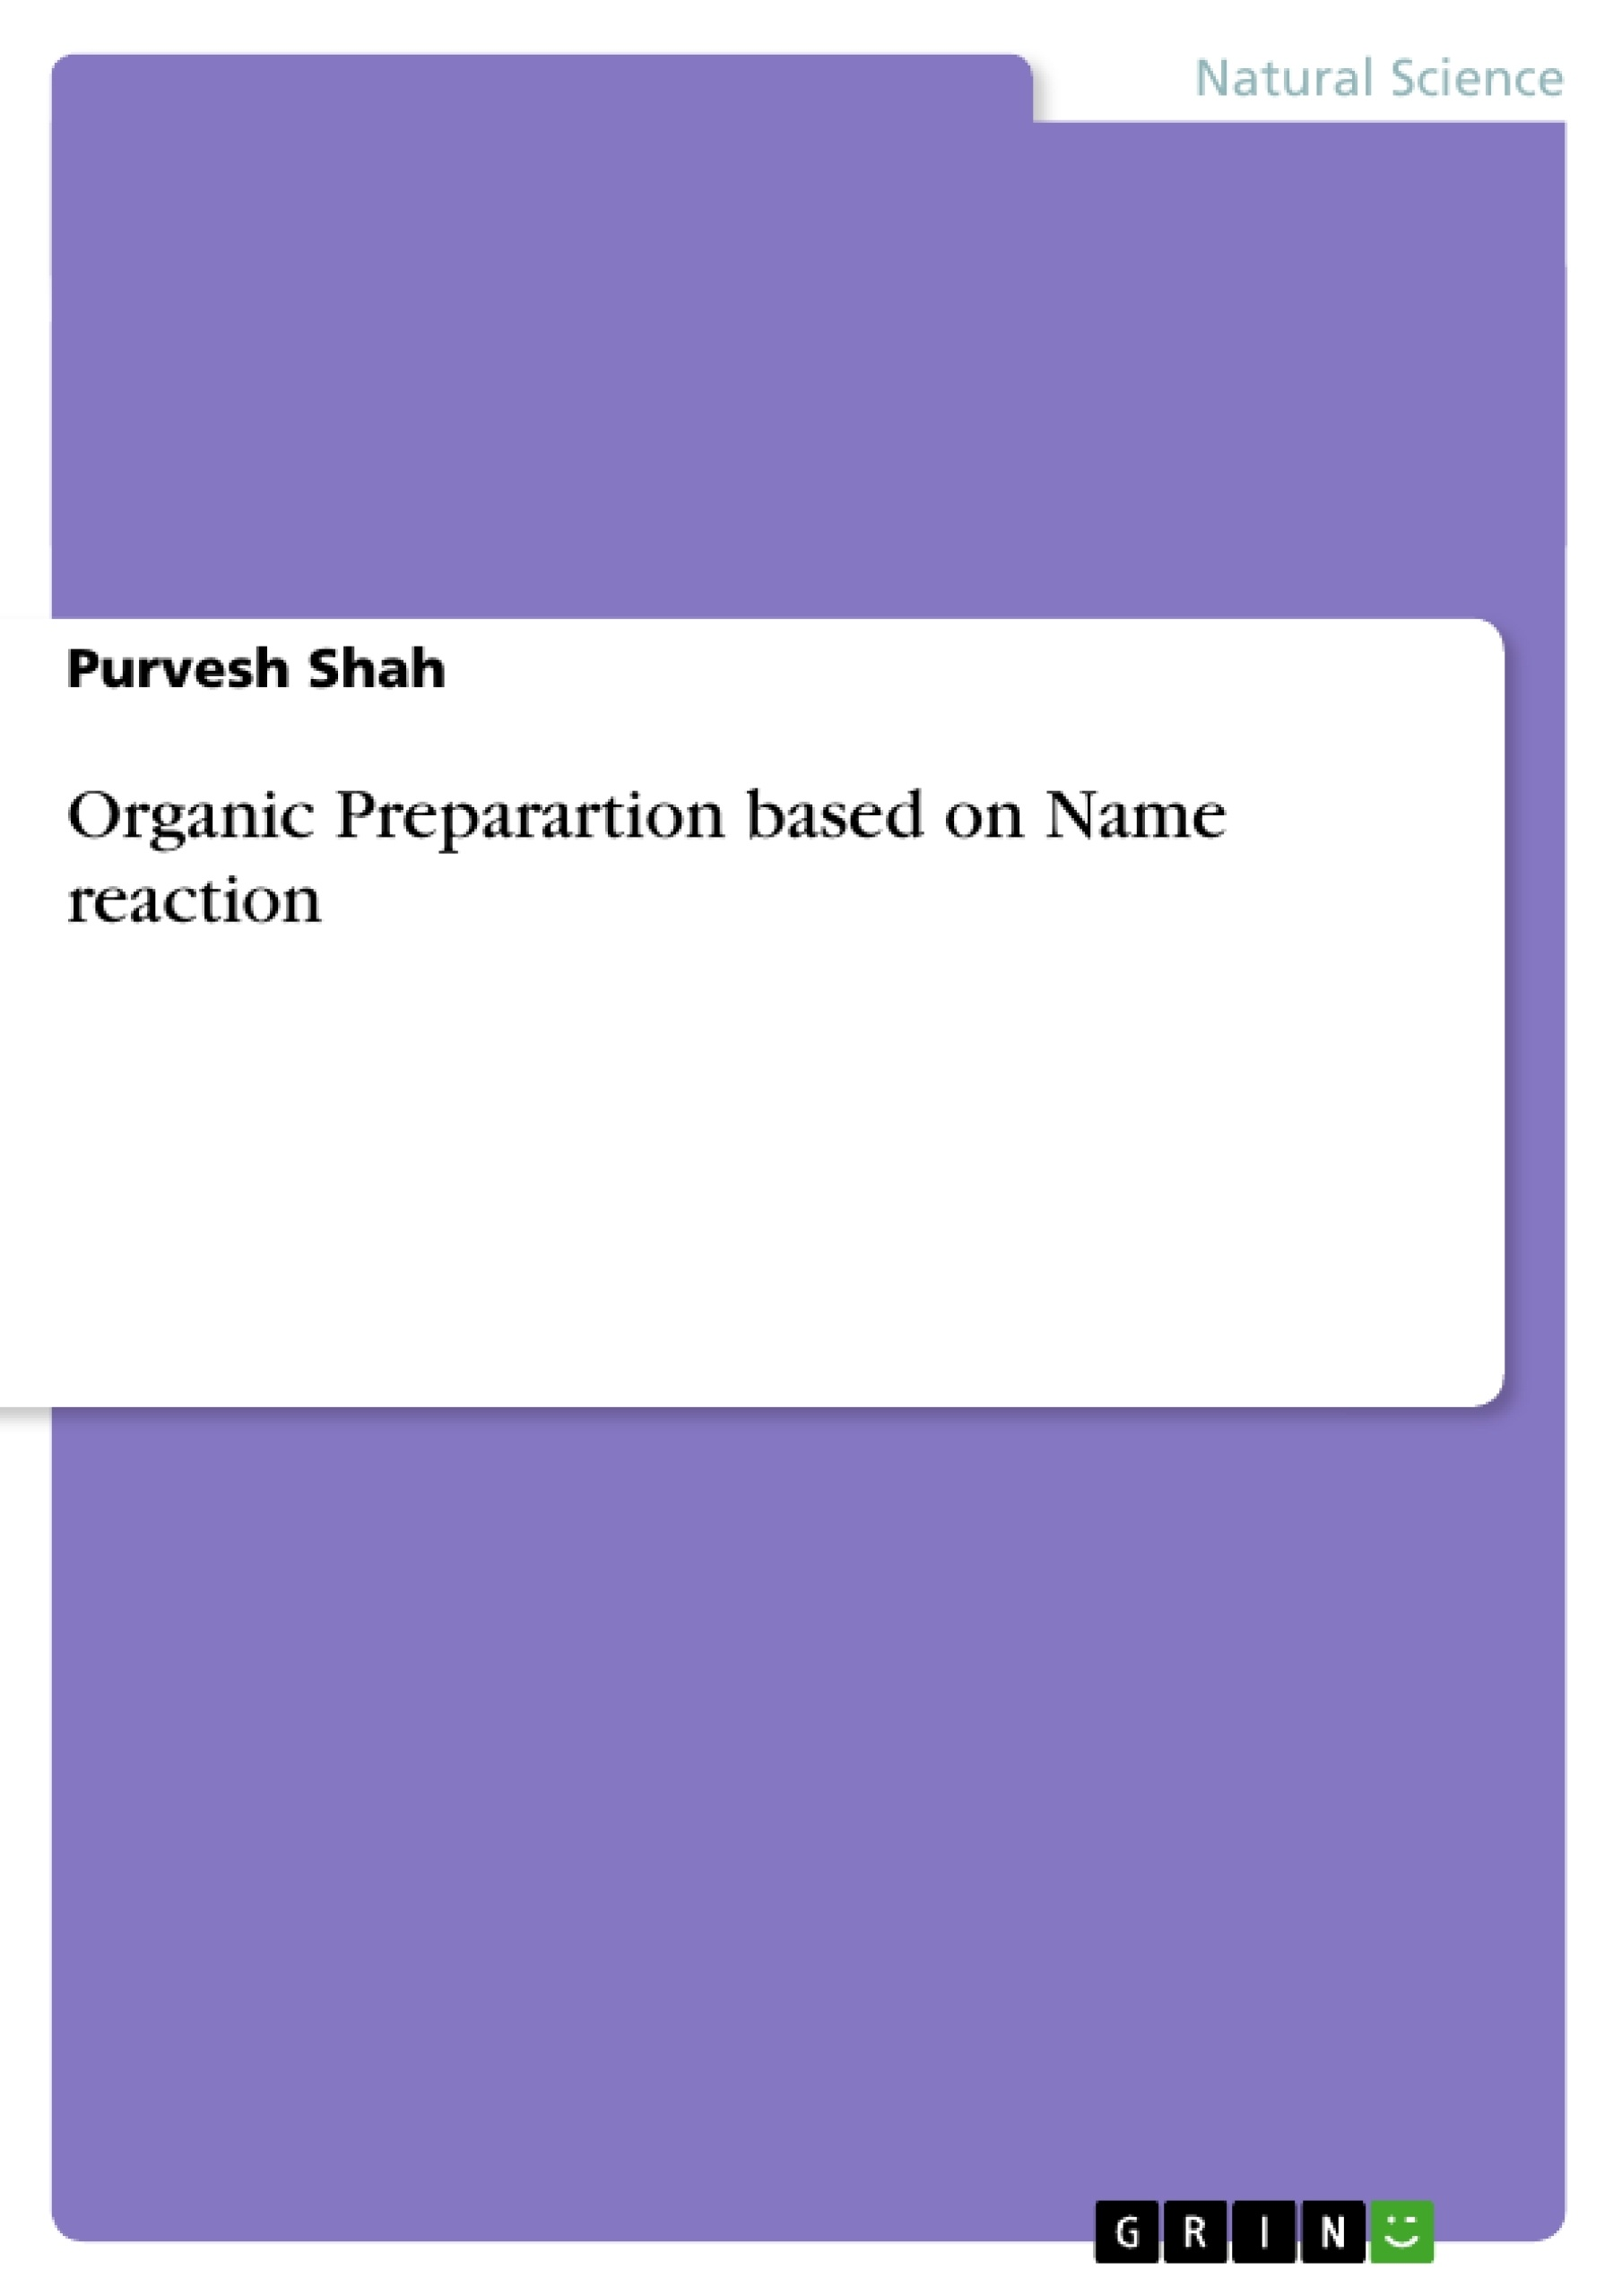 Title: Organic preparation based on name reaction